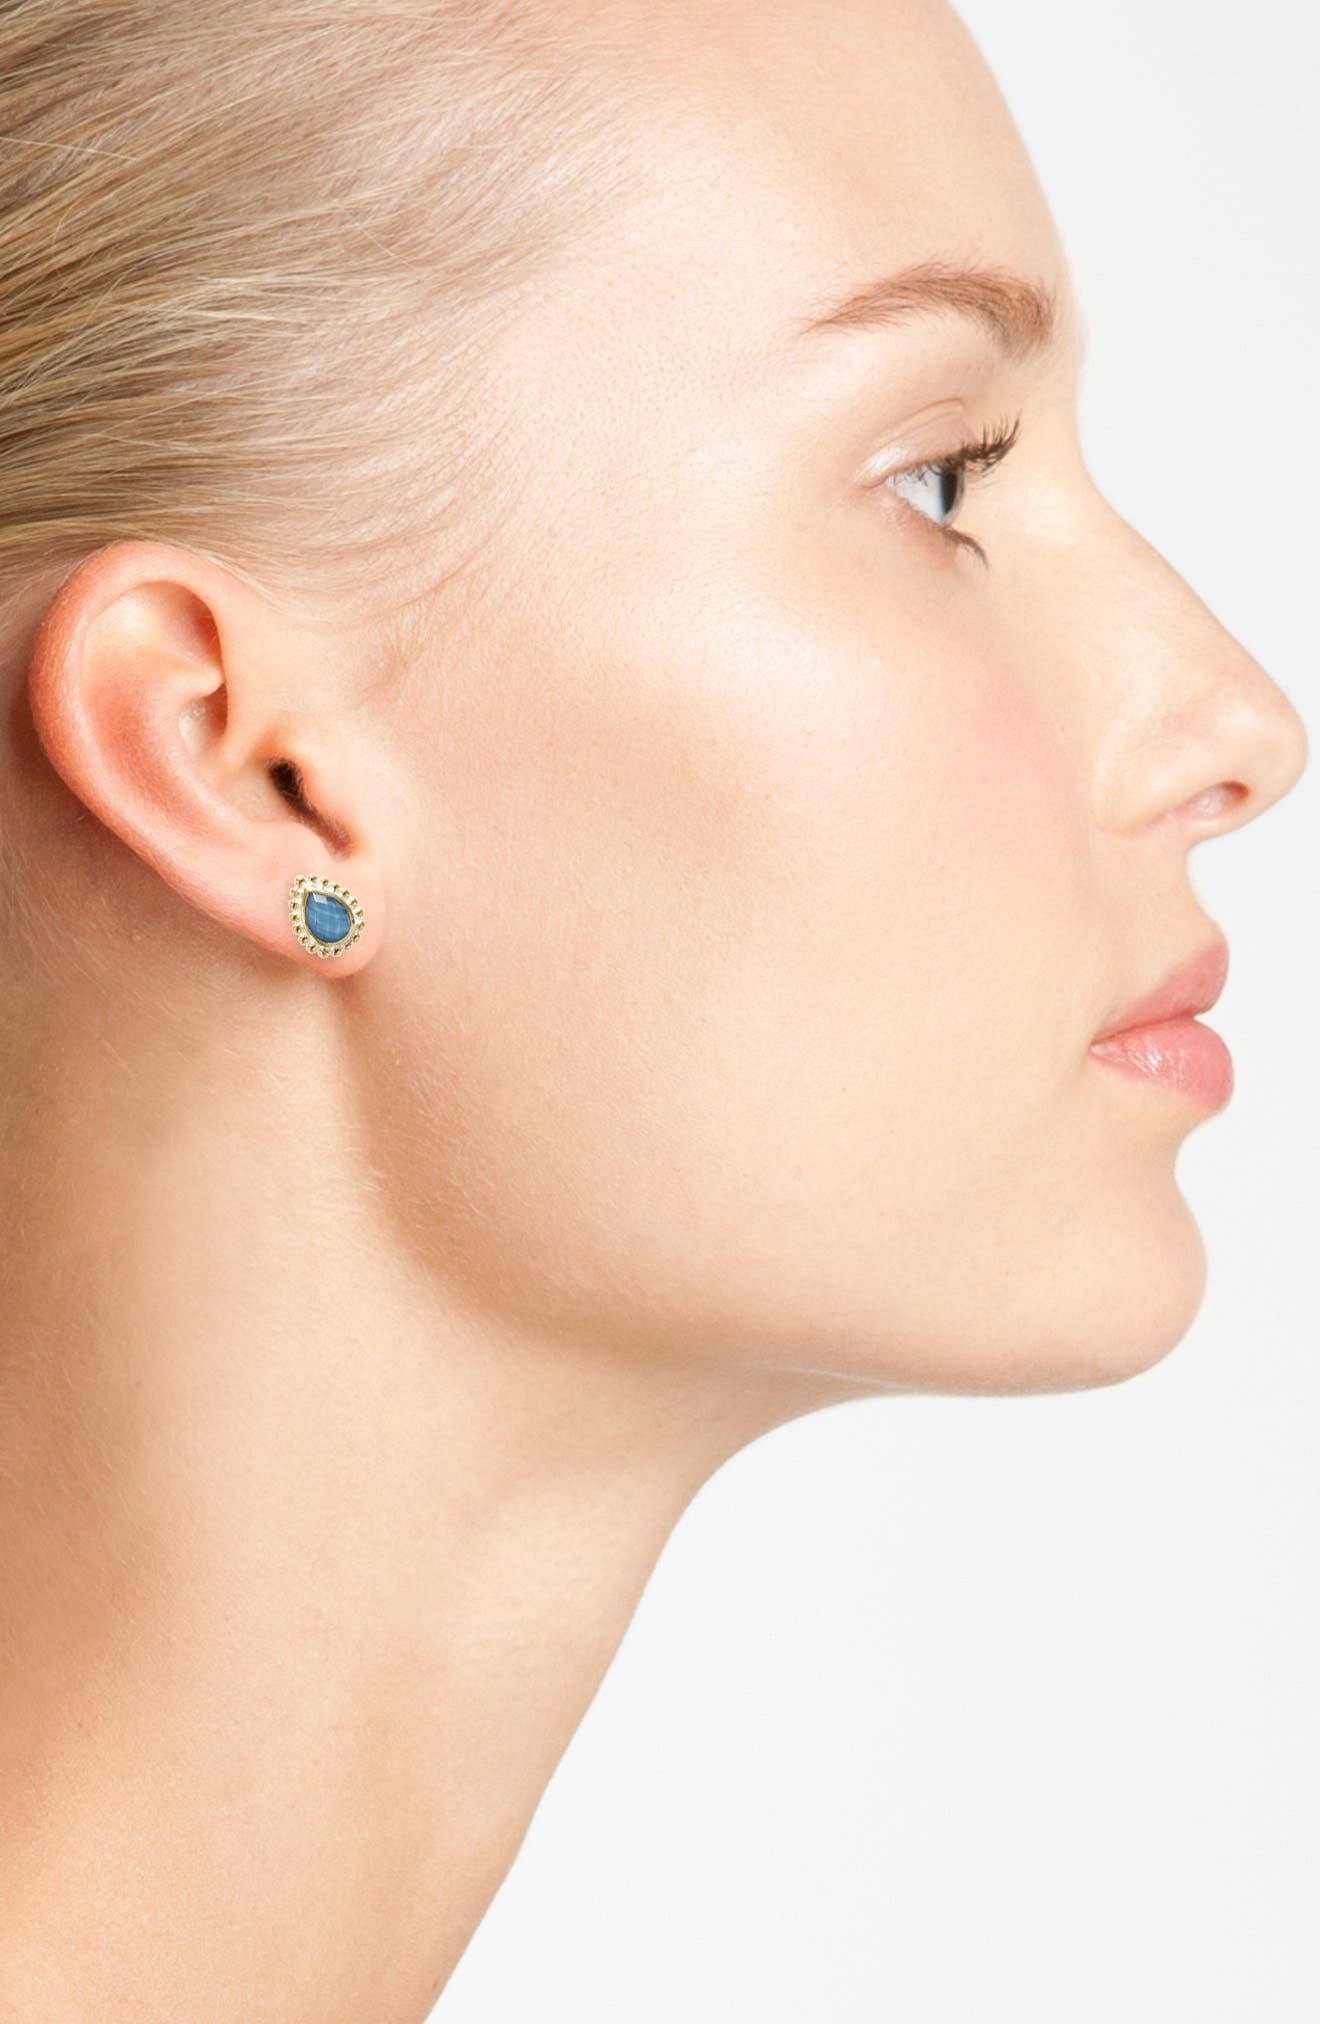 Blue Quartz Teardrop Stud Earrings,                             Alternate thumbnail 2, color,                             400